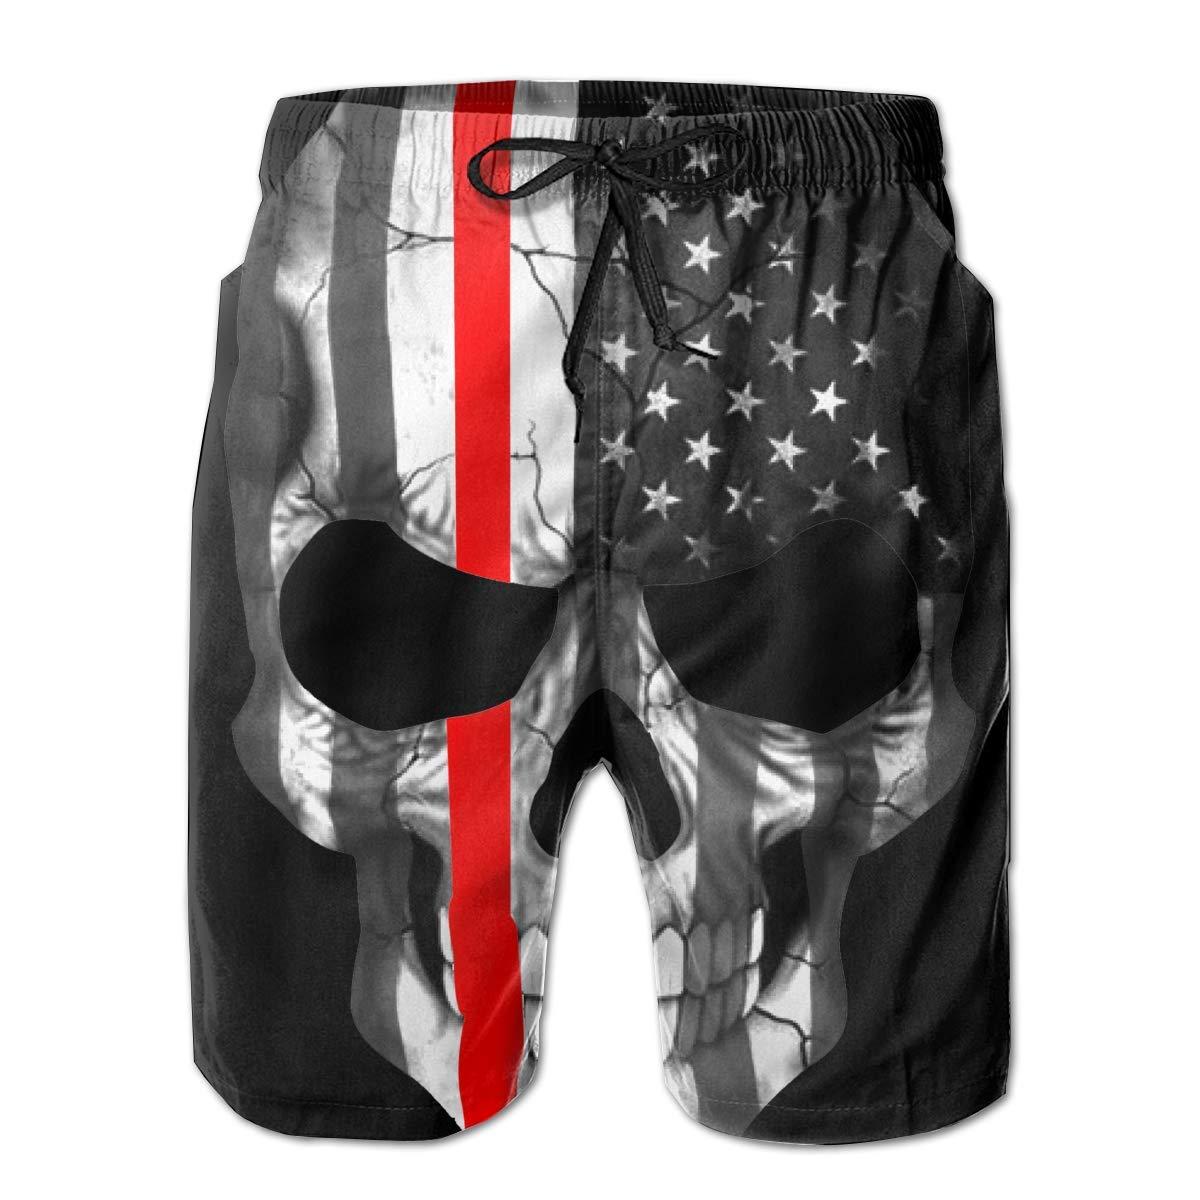 Firefighter Sticker Thin Red Line Skull Boardshorts Mens Swimtrunks Fashion Beach Shorts Casual Shorts Swim Trunks